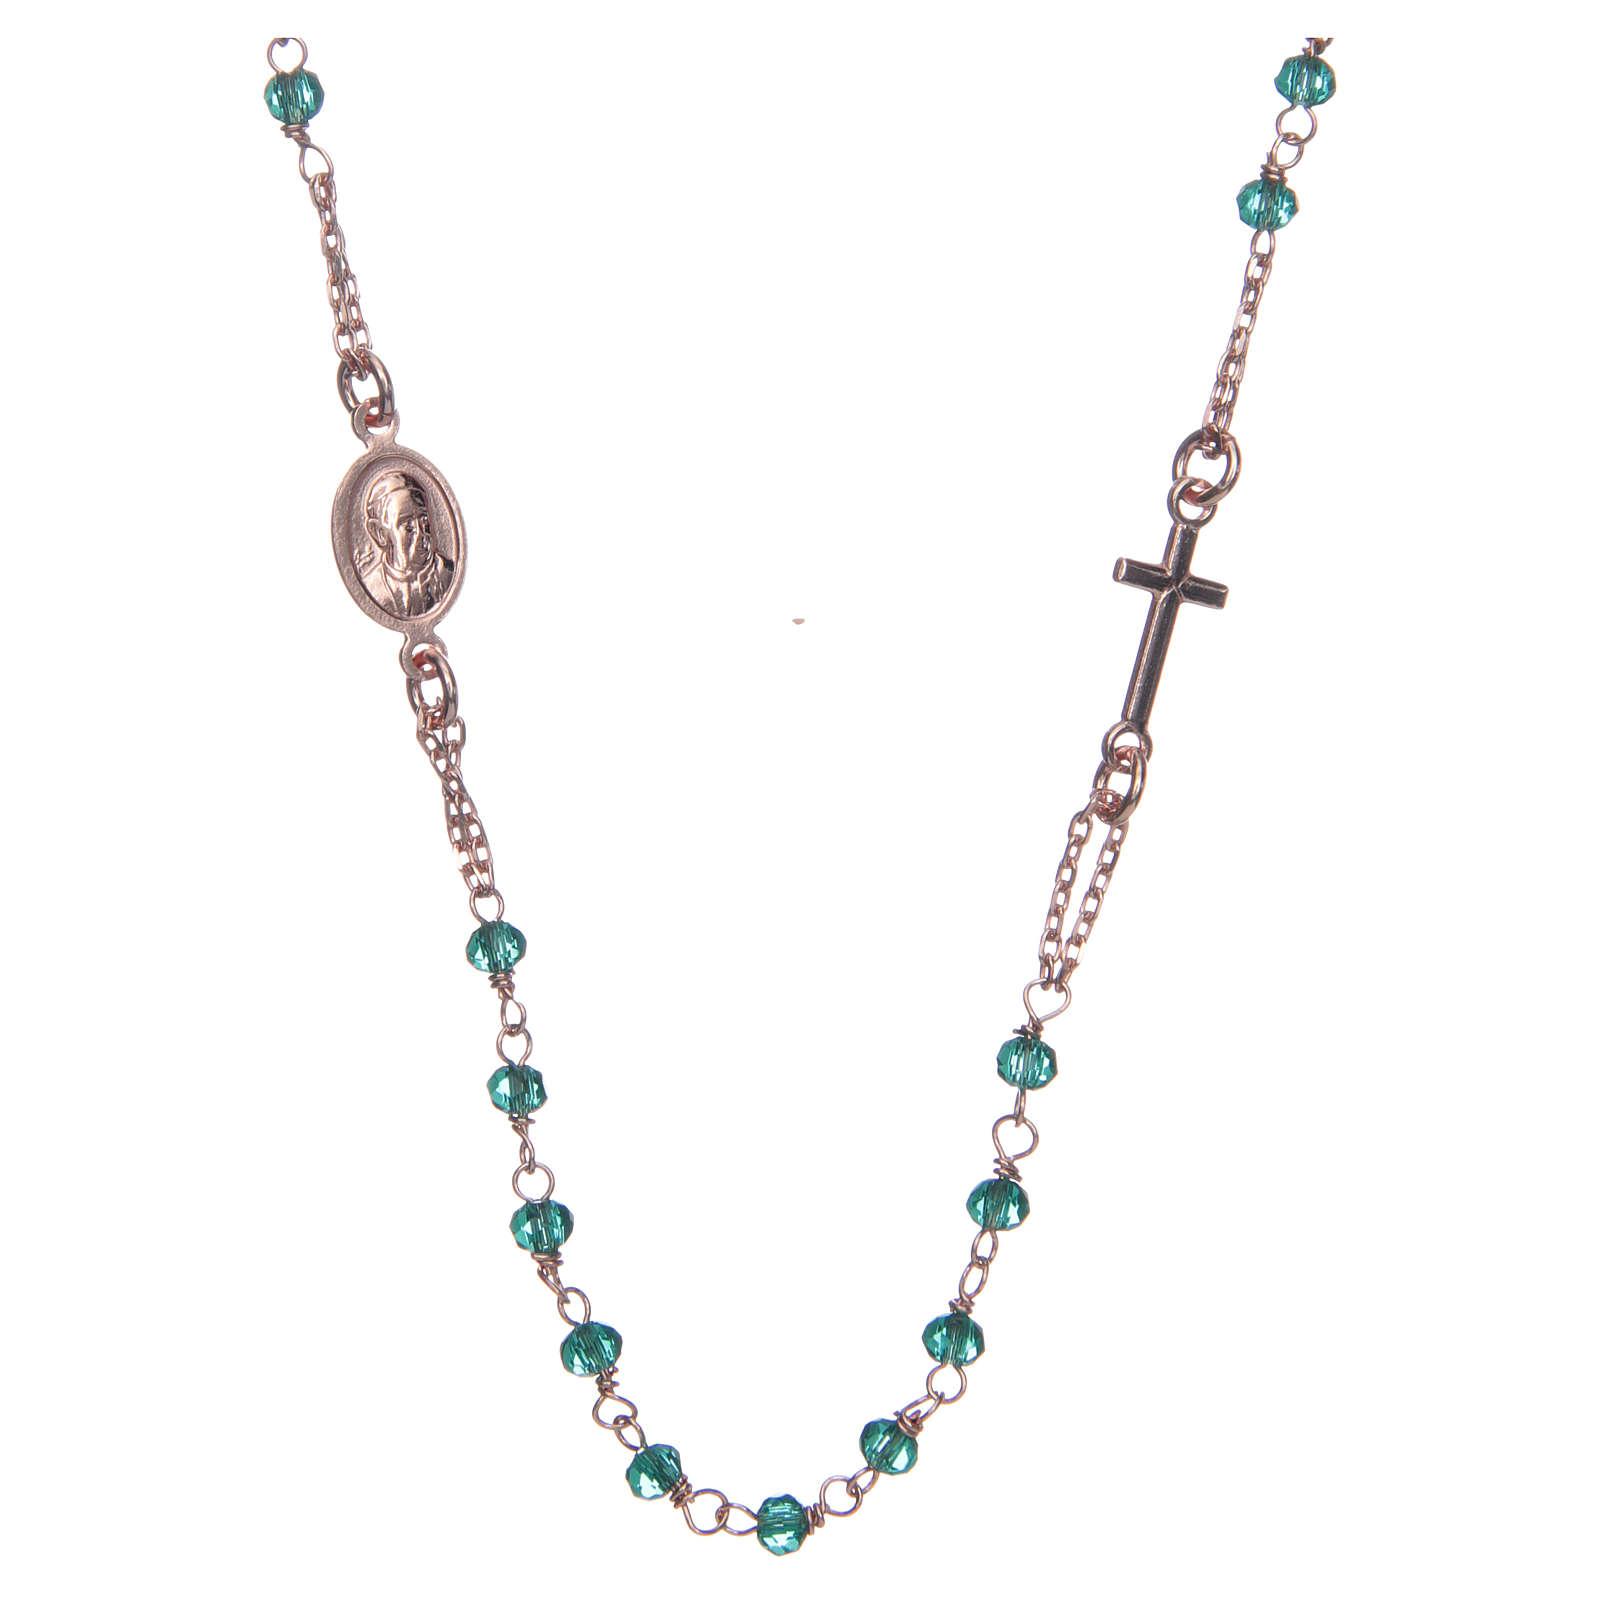 Colar terço gargantilha AMEN cristais verdes prata 925 acab. rosê 4